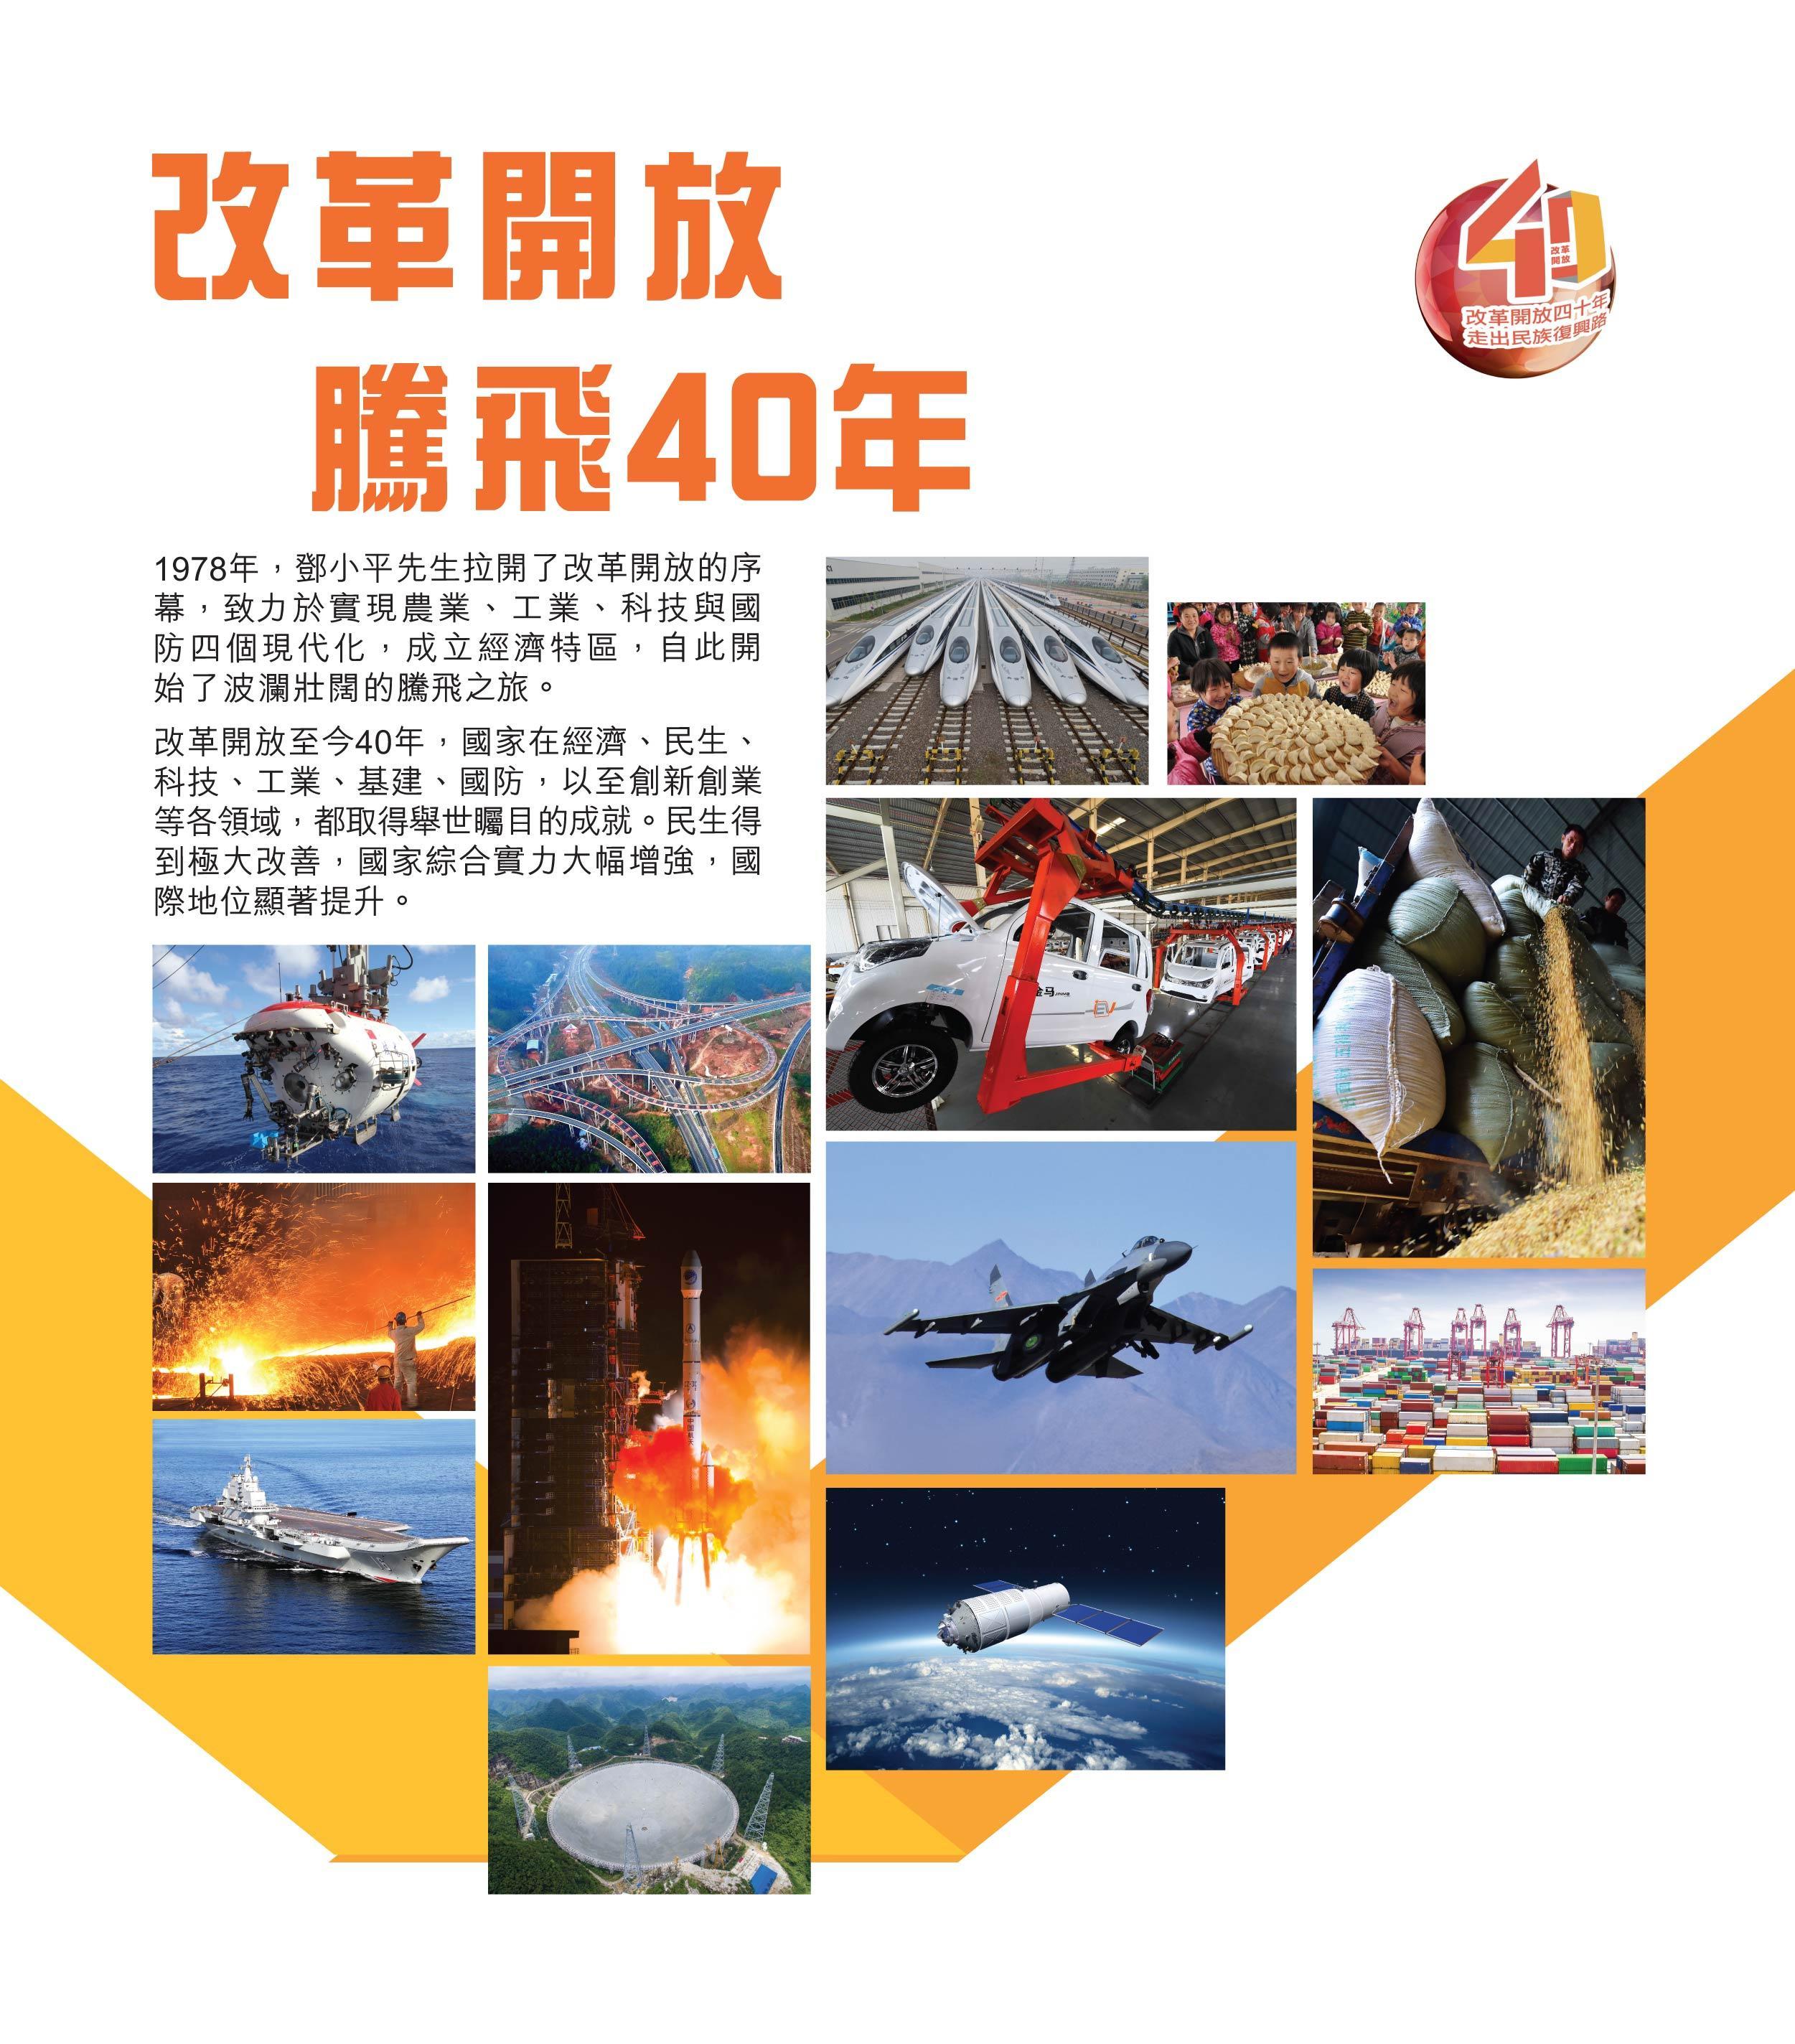 innotech_40anni_hk-cn-layout_zhanbanyi_aw_oct29_websize_gaigekaifang